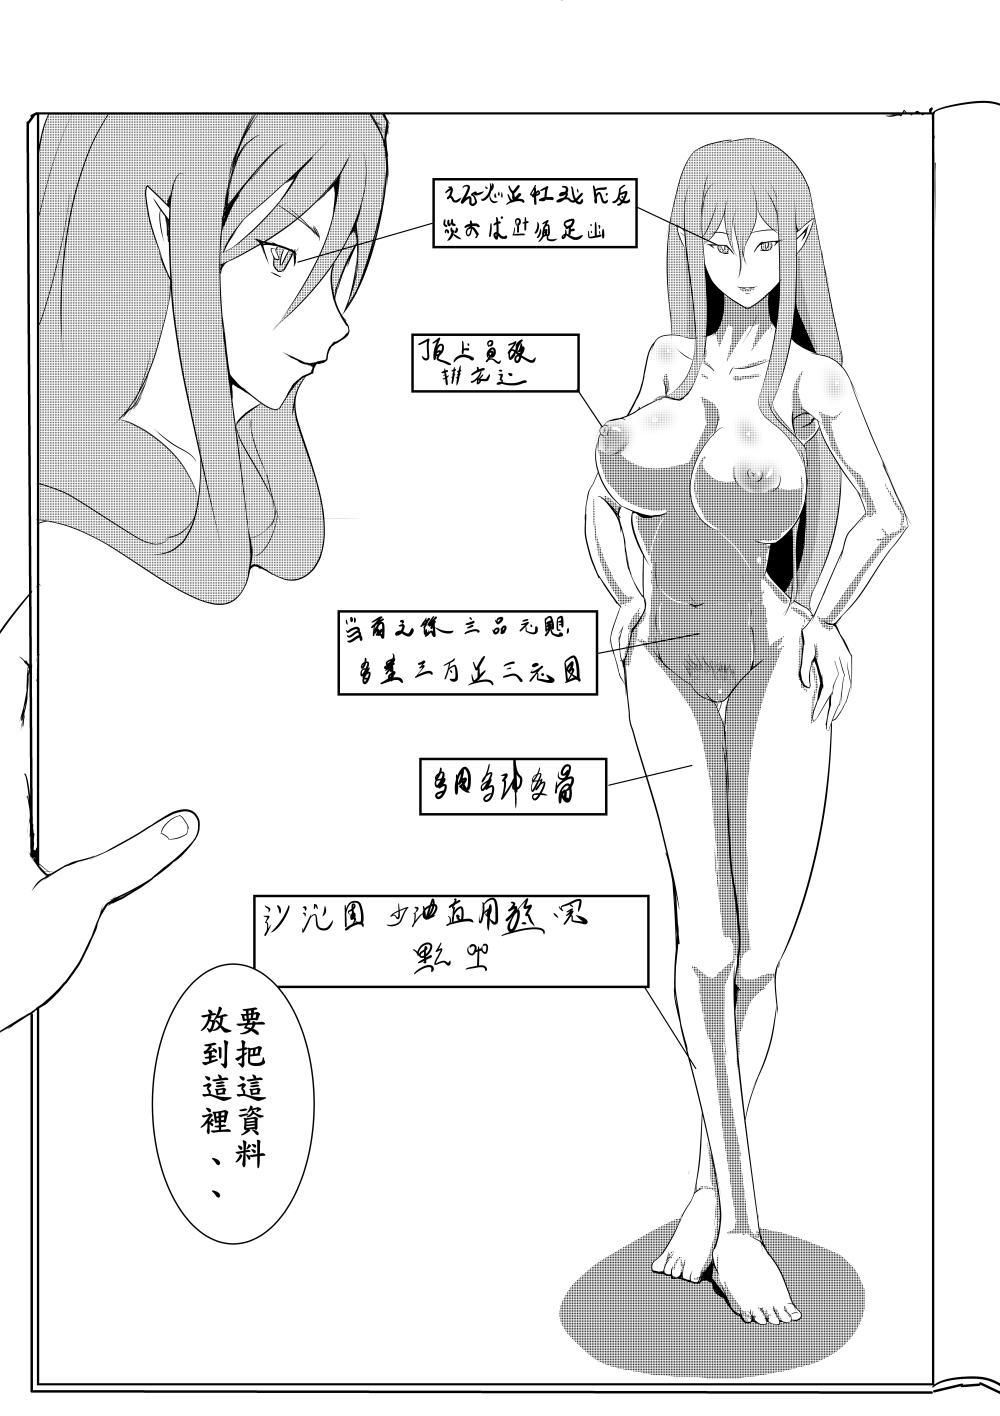 Maou Yuusha - Kachiku Kiki 3 73